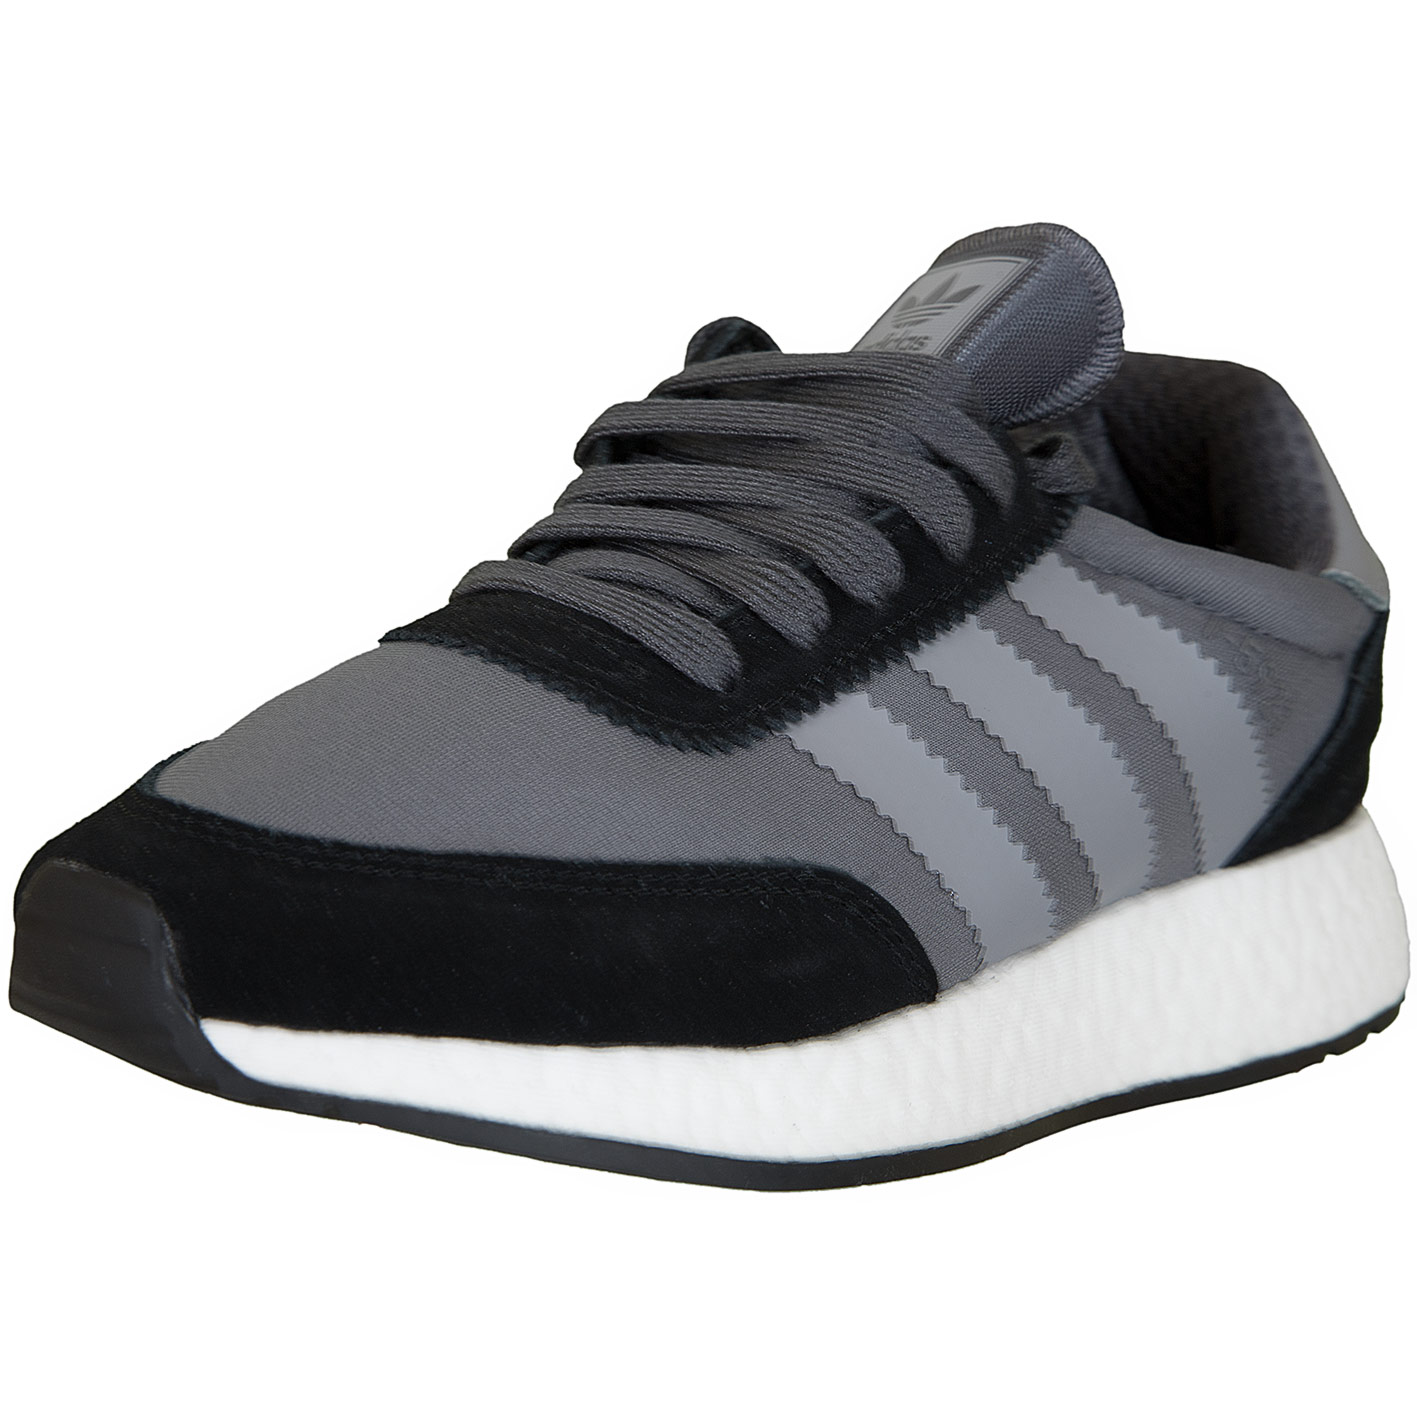 Adidas Schwarzgrau 5923 Sneaker Originals Damen I R354jLAq